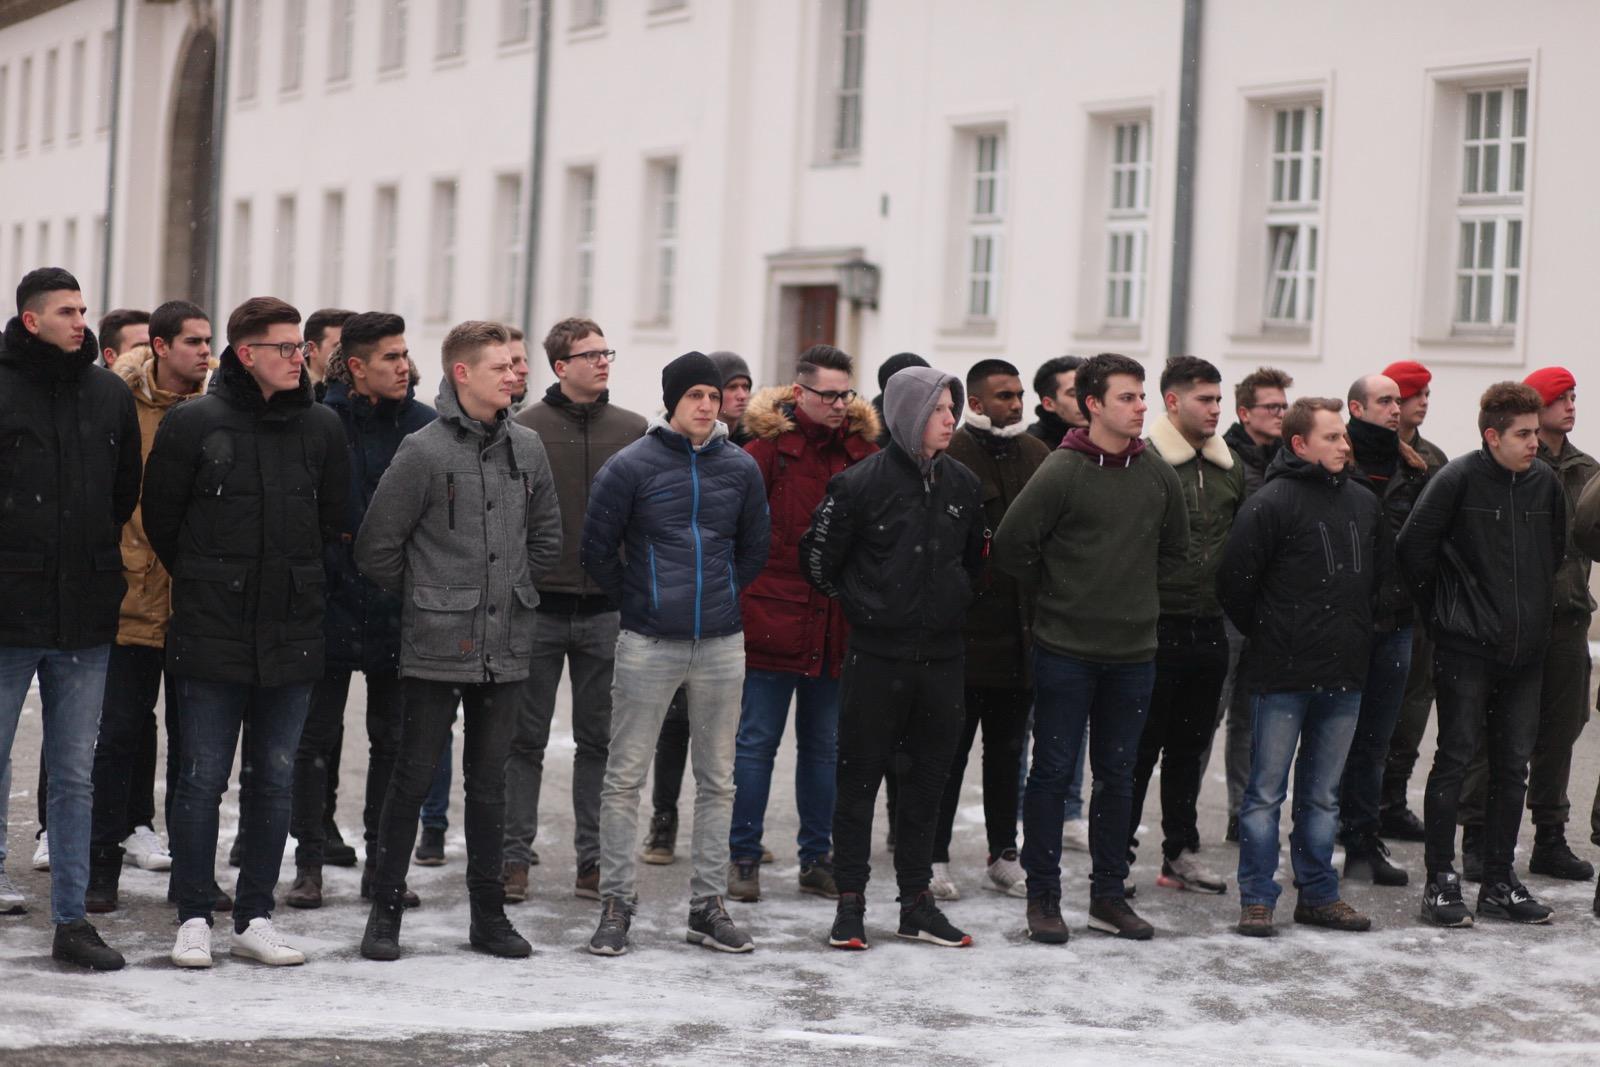 2019_01_03_3Gardekompanie_Verabschiedung - 11 of 15